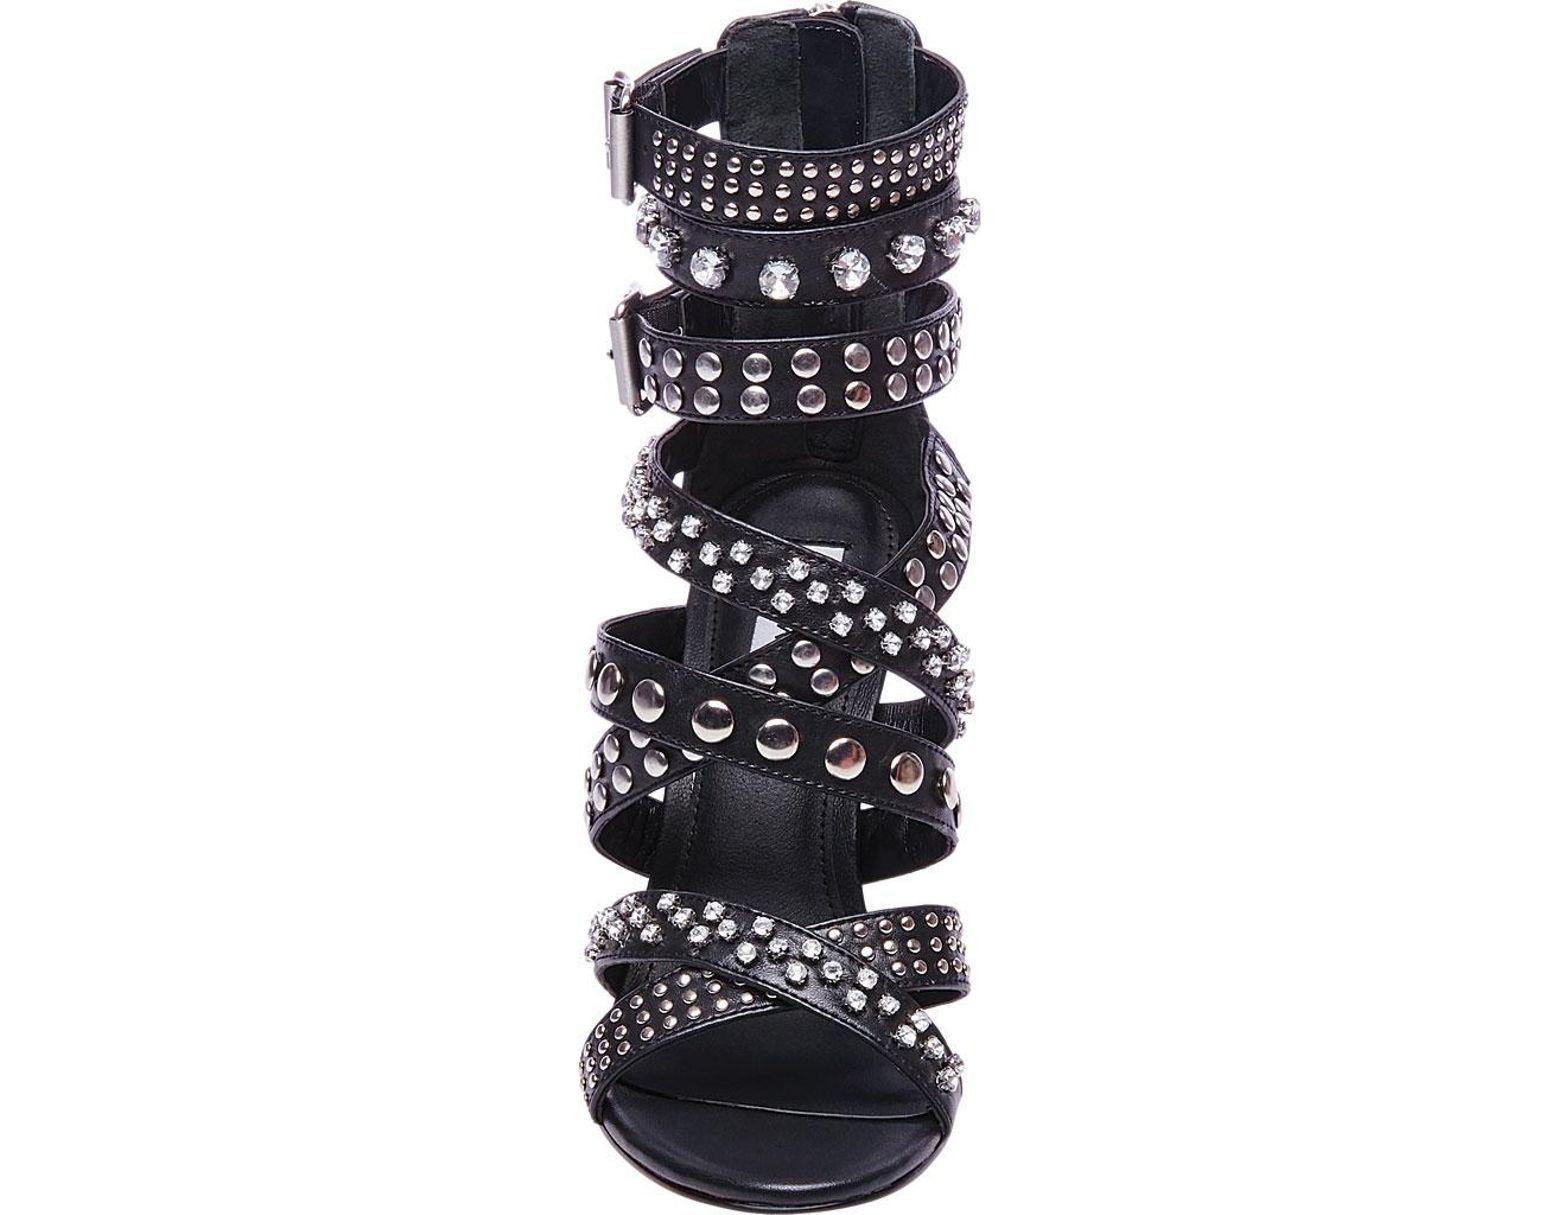 ede93d99dbe9 Lyst - Steve Madden Moto Studded Ankle Strap Sandal in Black - Save 29%